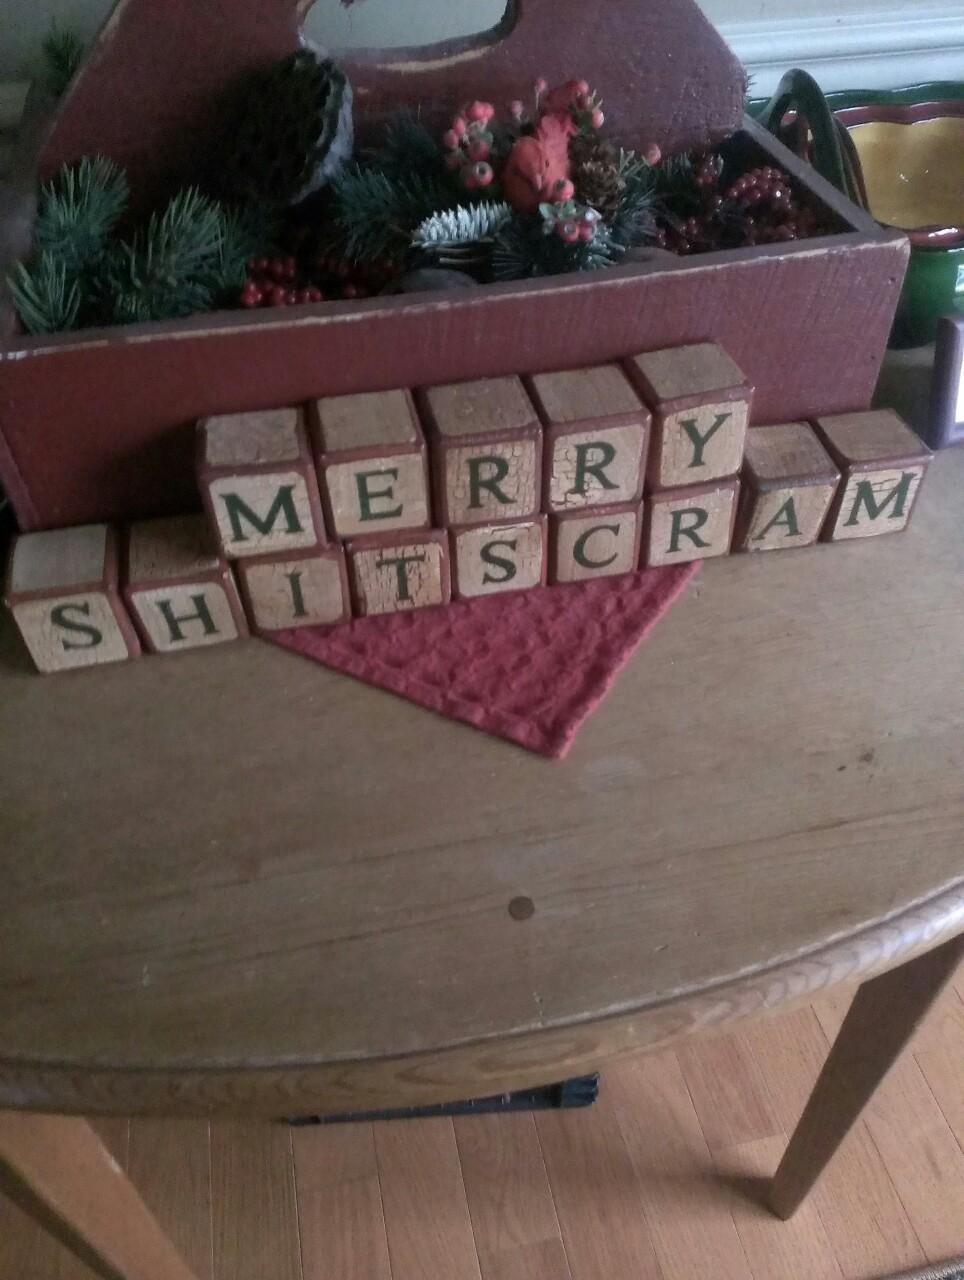 merry shit....xmas